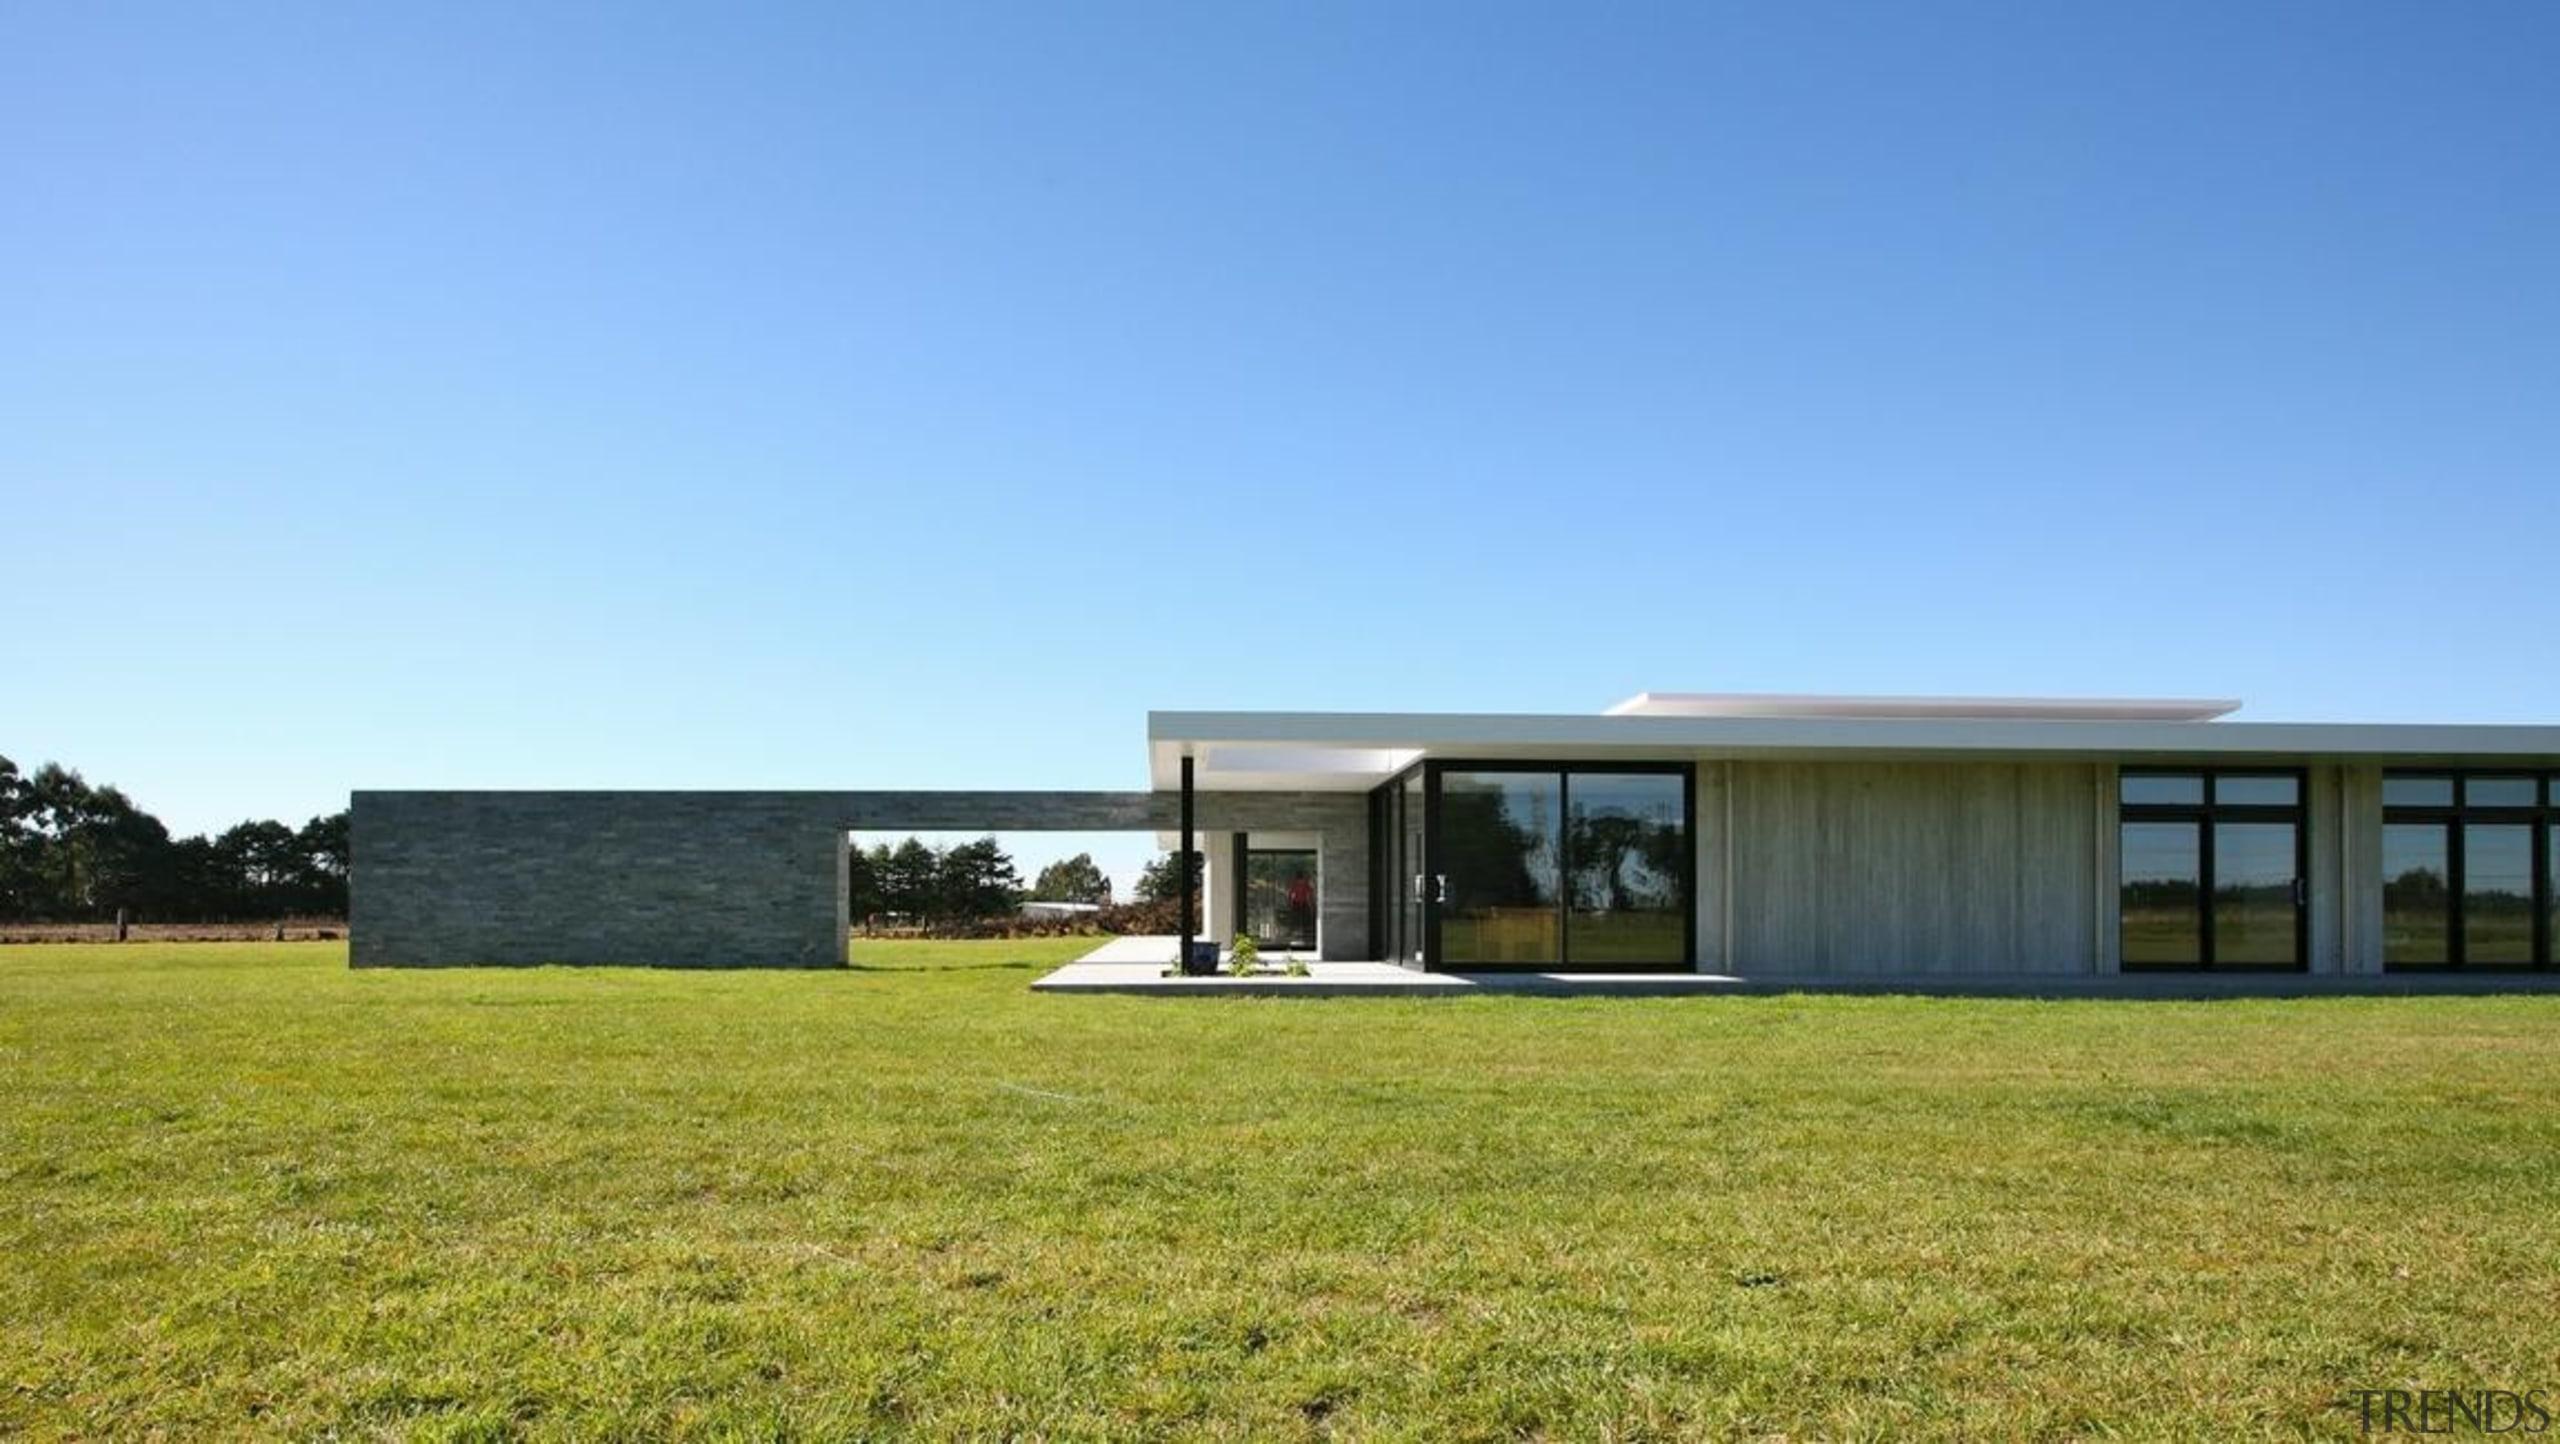 Christchurch House - Christchurch House - architecture | architecture, cottage, estate, facade, farmhouse, grass, home, house, land lot, landscape, property, real estate, sky, teal